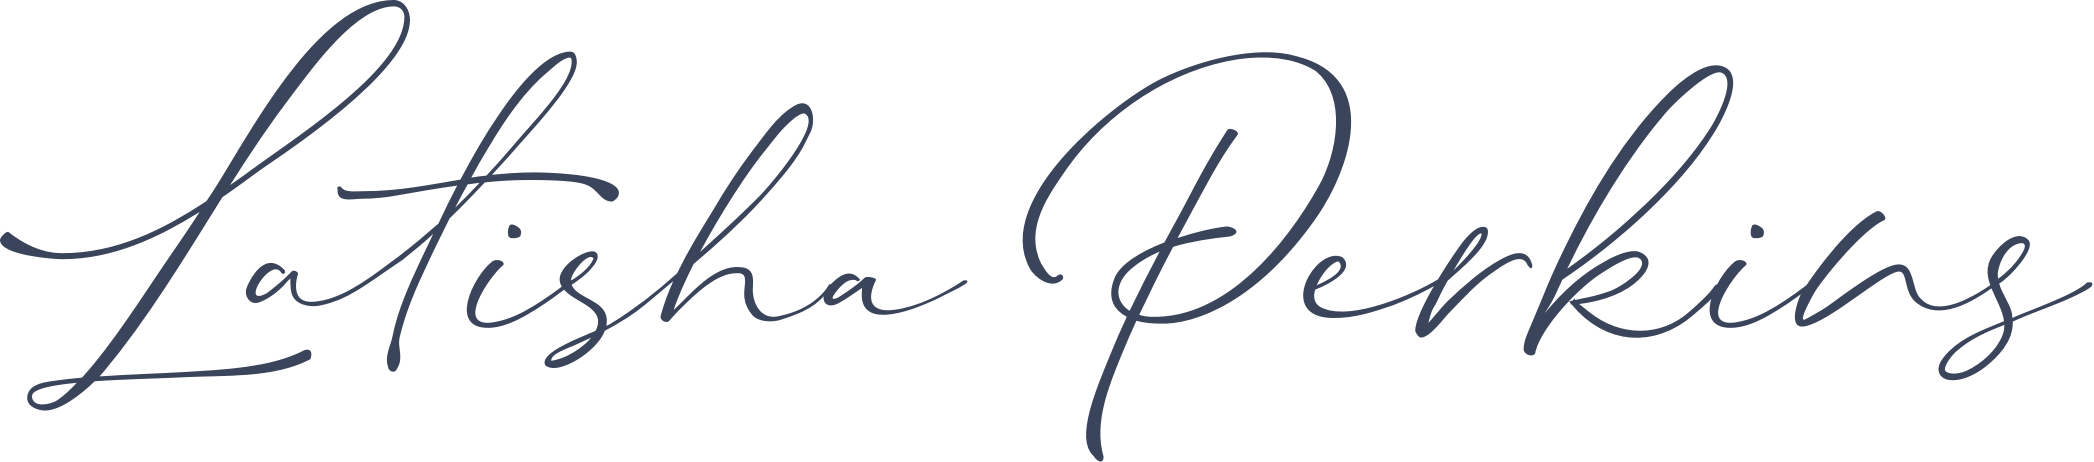 latisha-signature.png